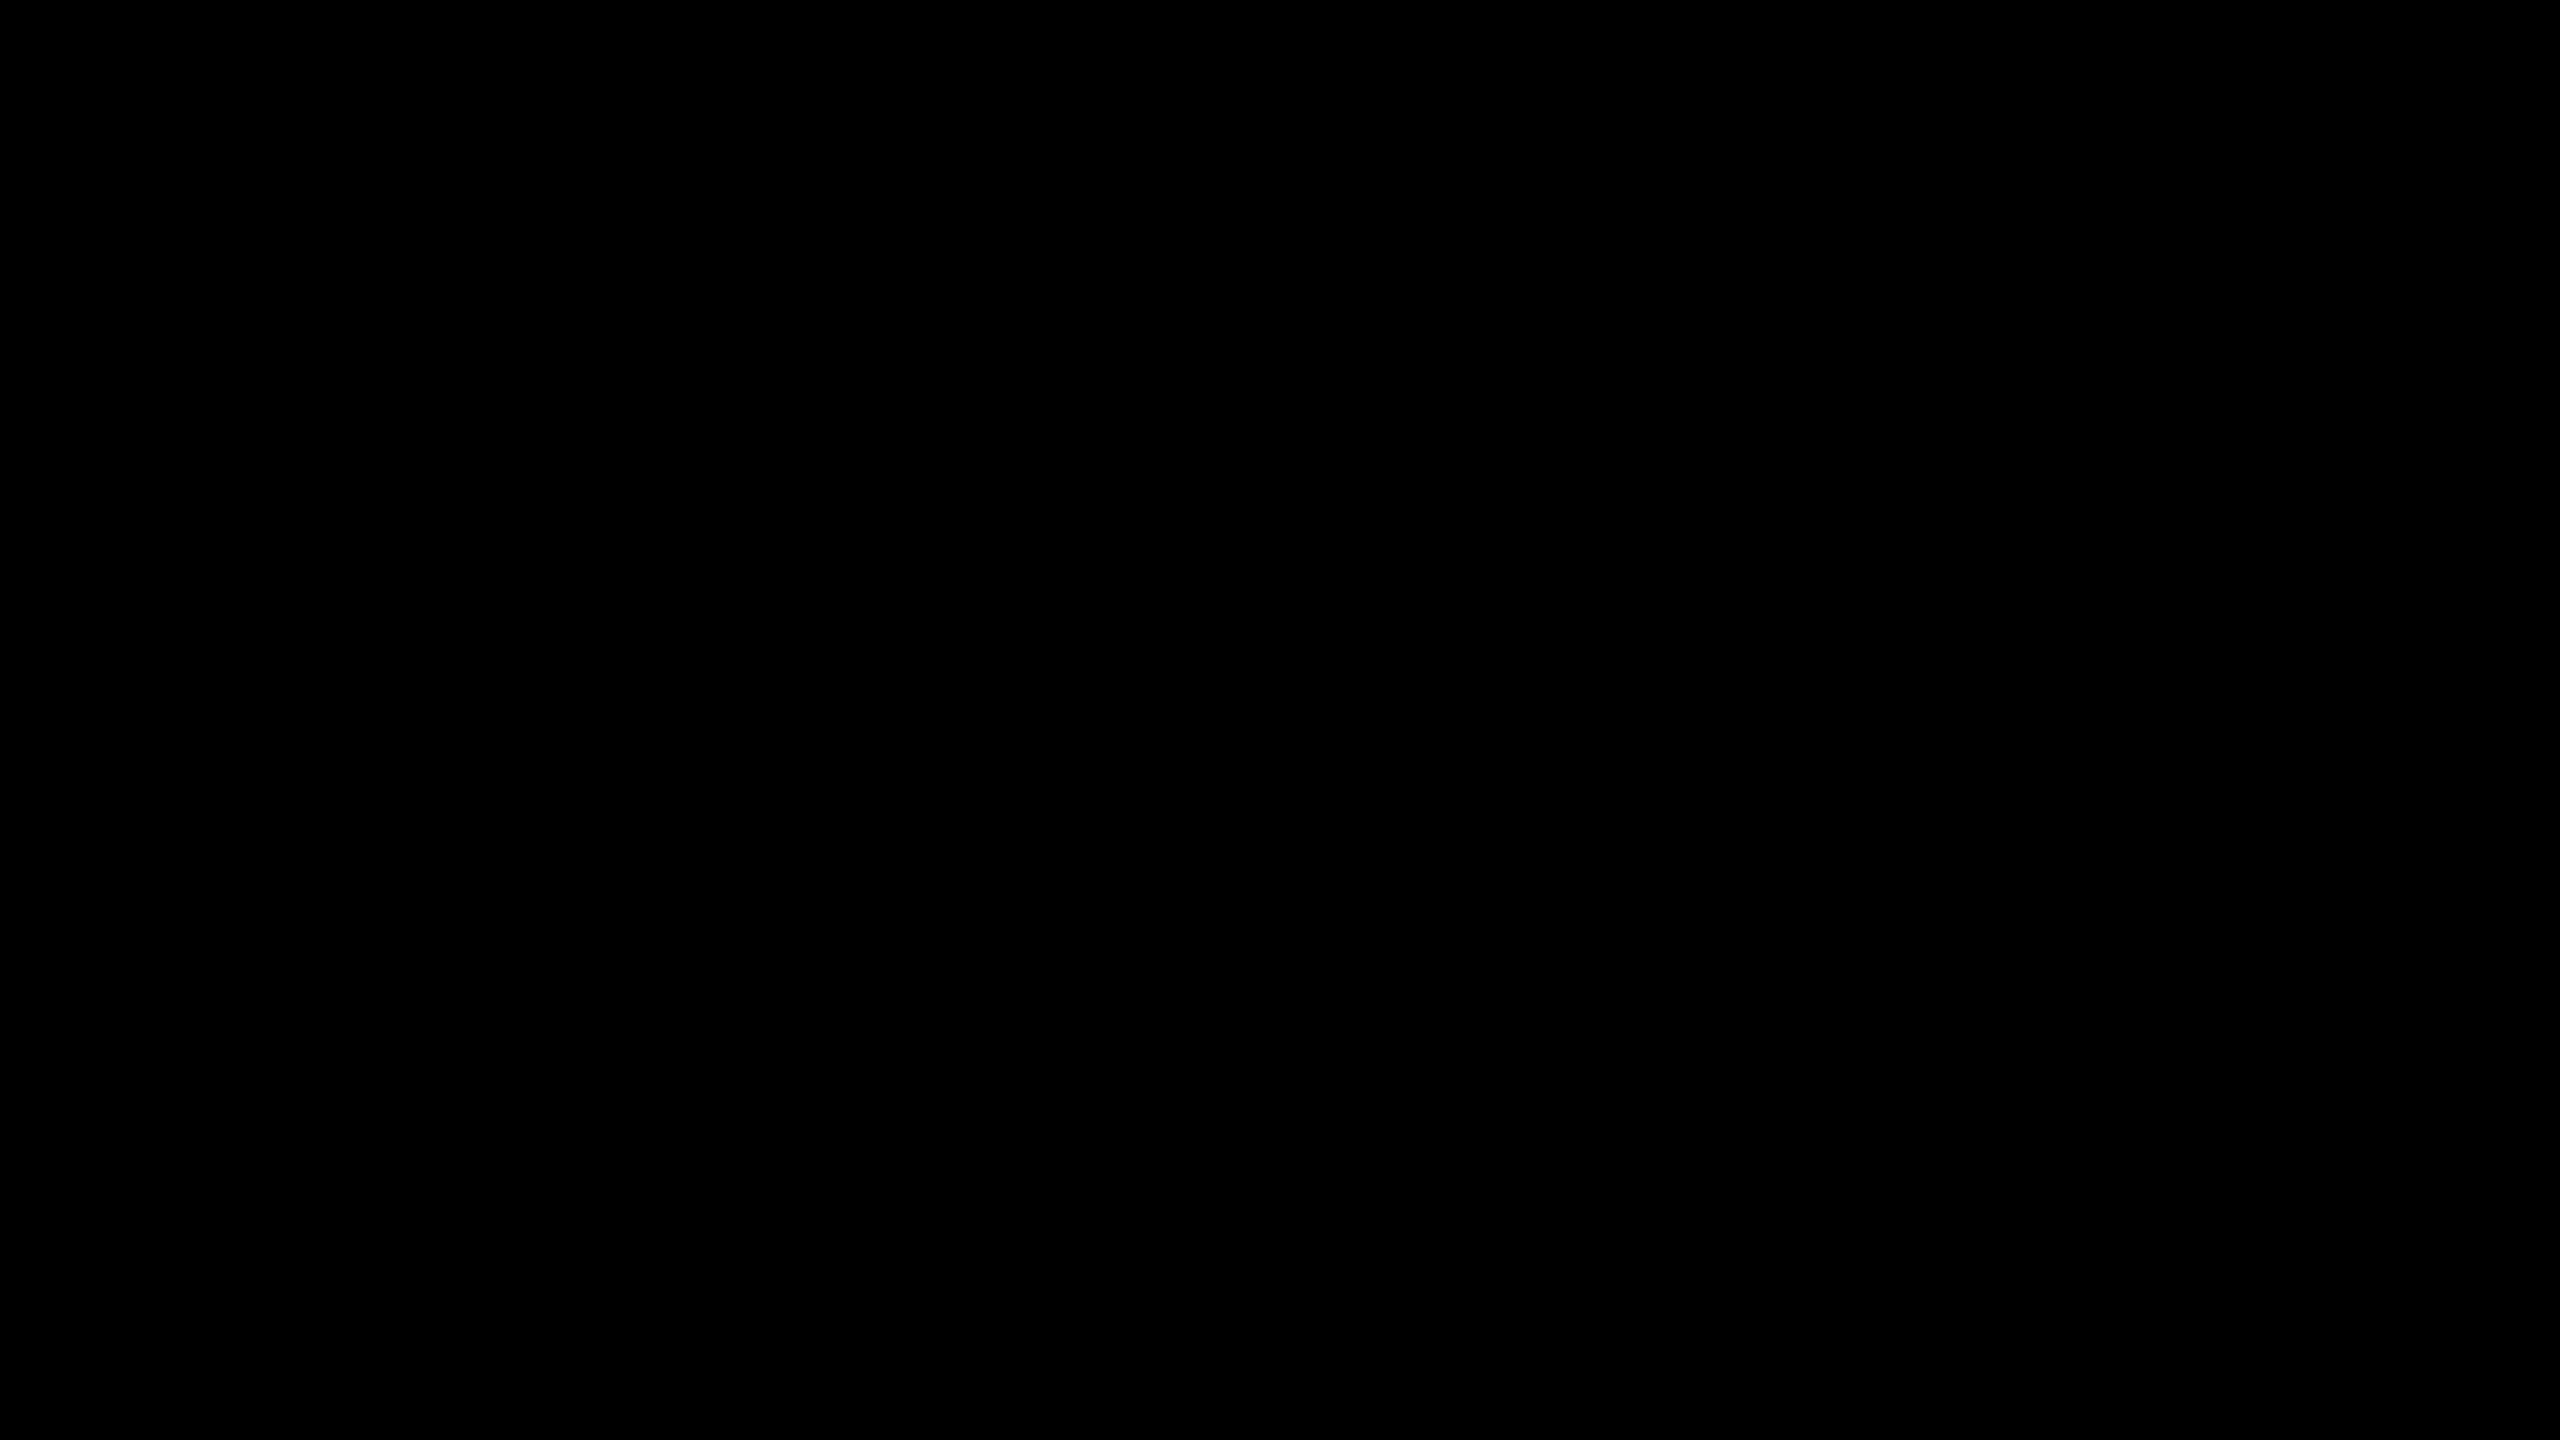 2560x1440 Black Solid Color Background